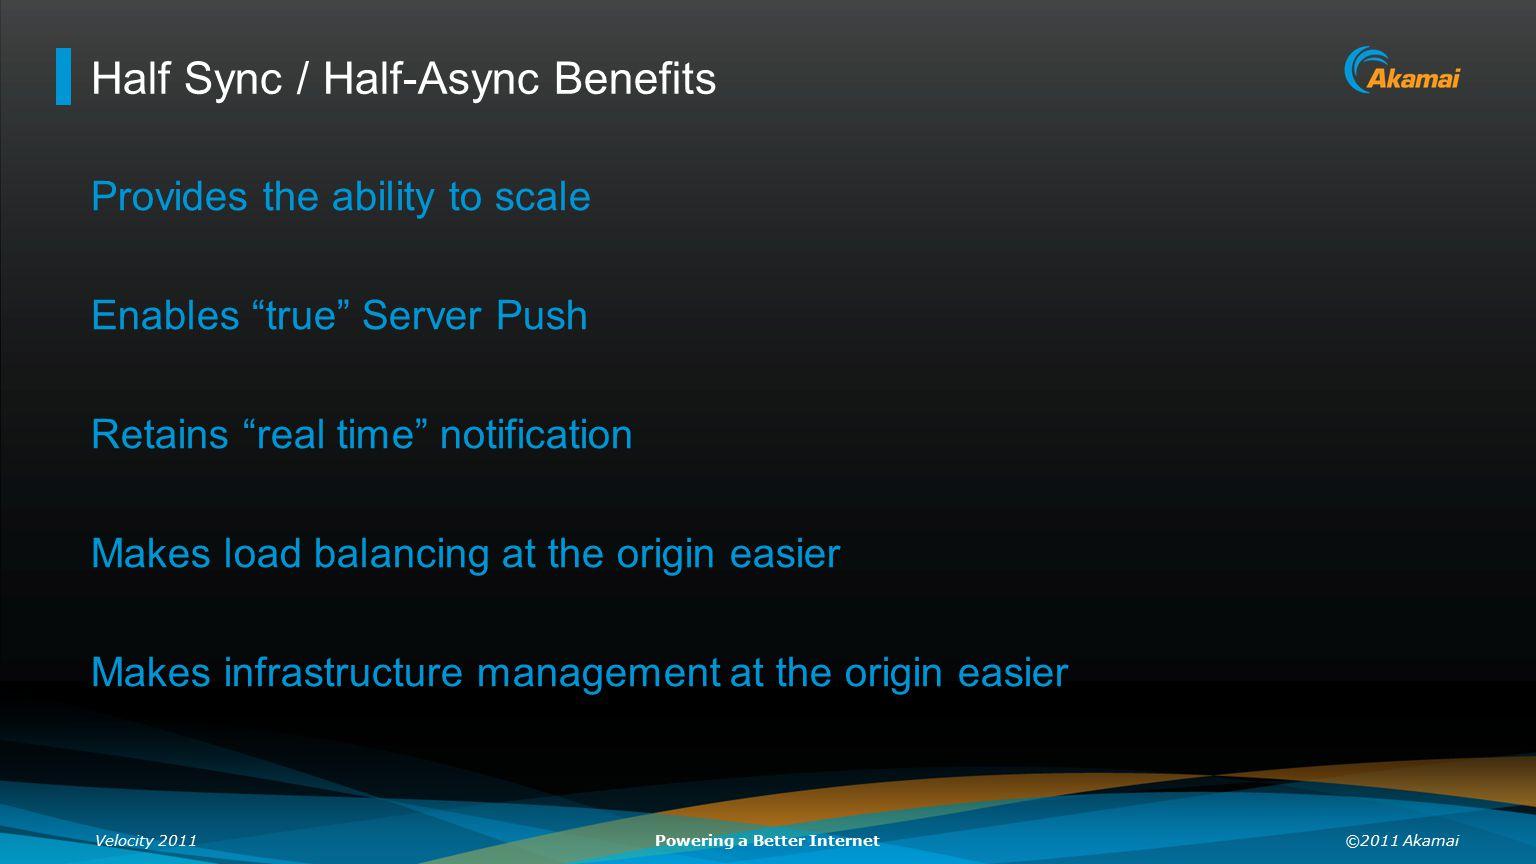 Half Sync / Half-Async Benefits